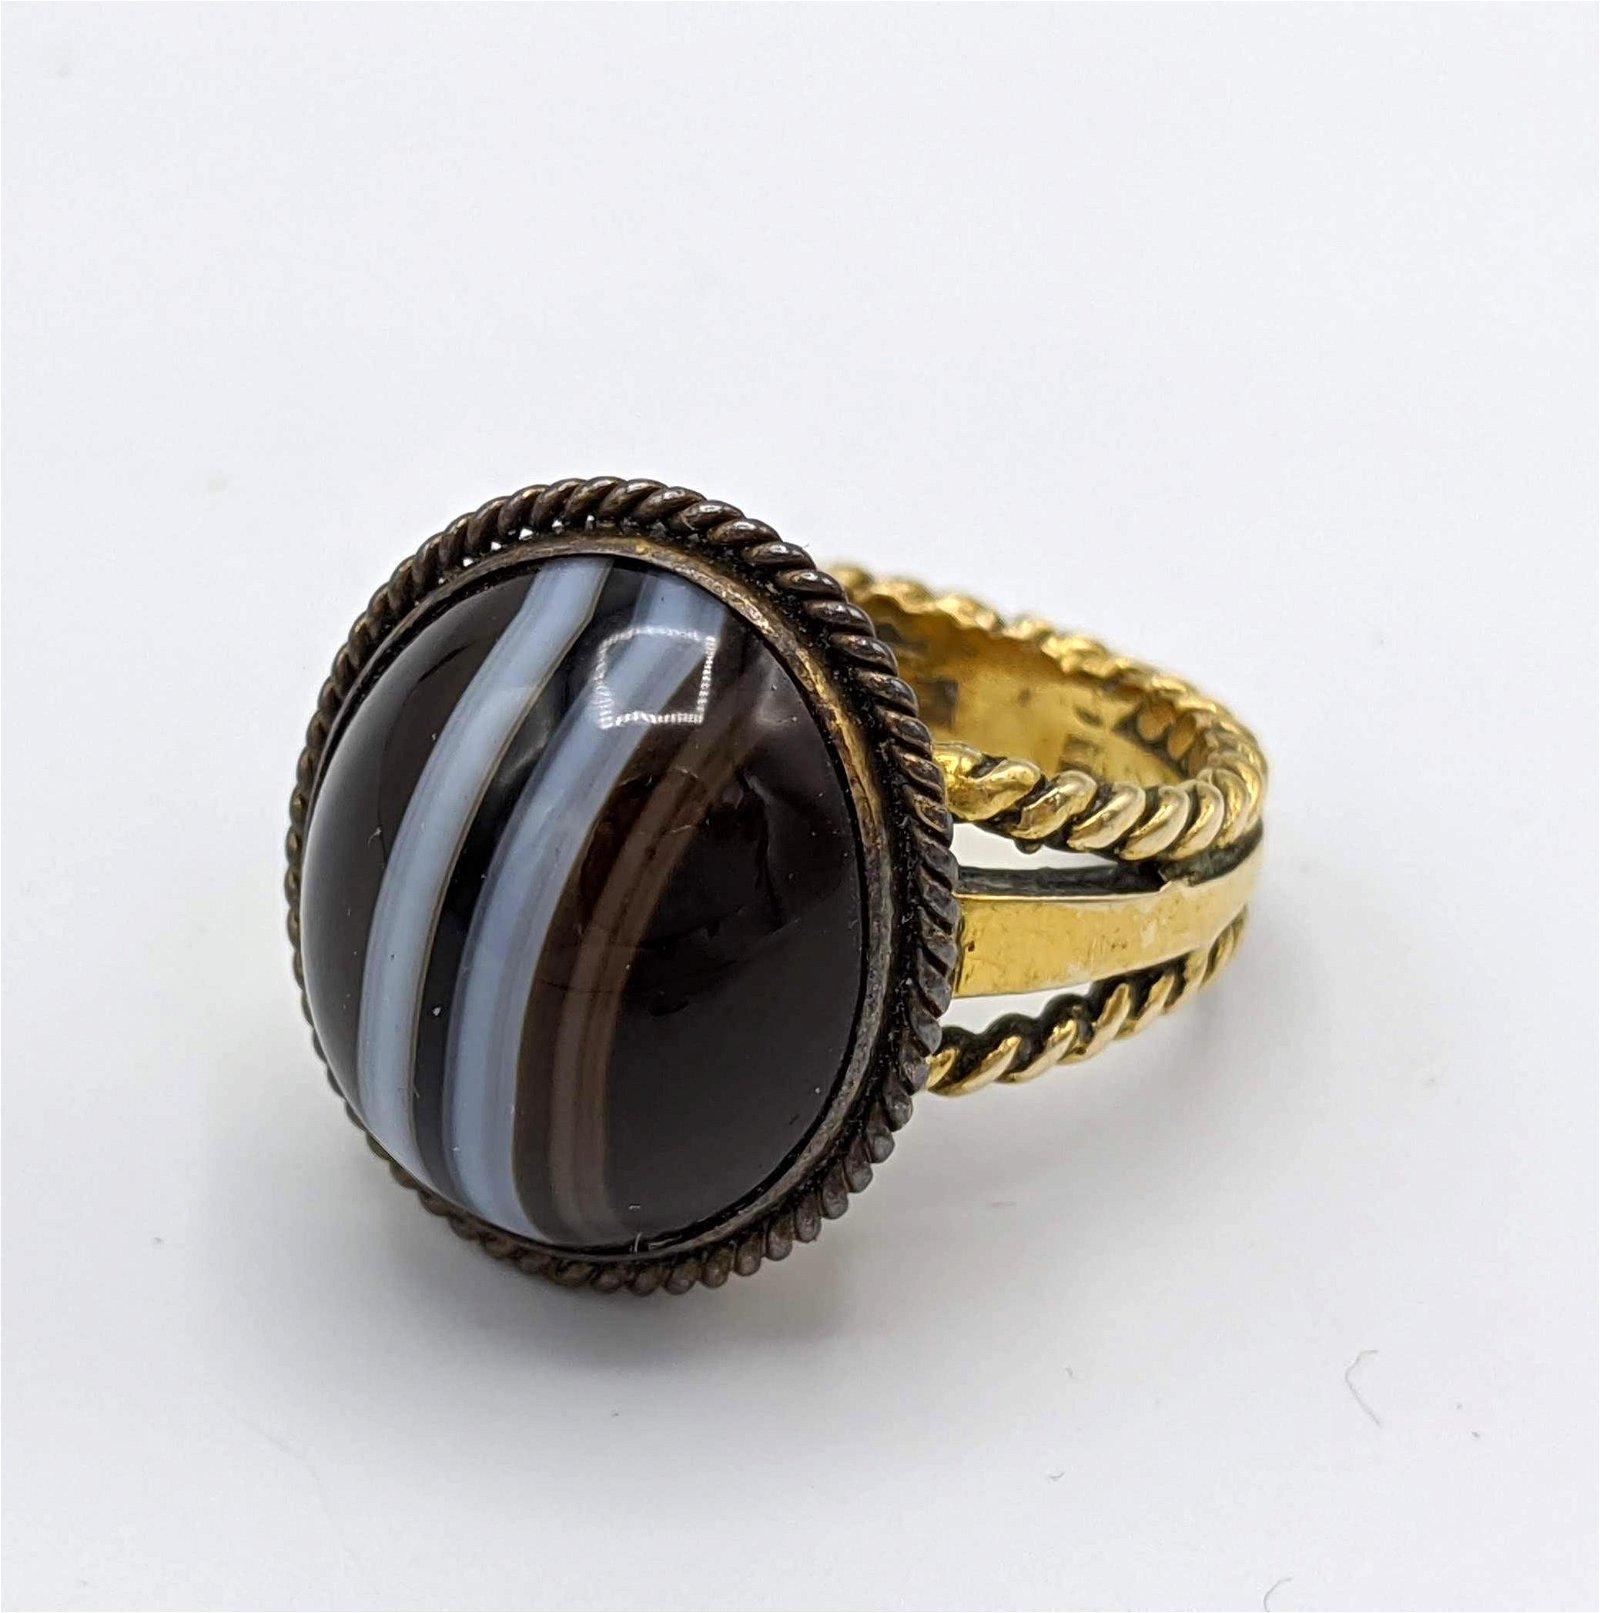 14K Gold Vintage Banded Agate Gold Ring. Rope trim moun